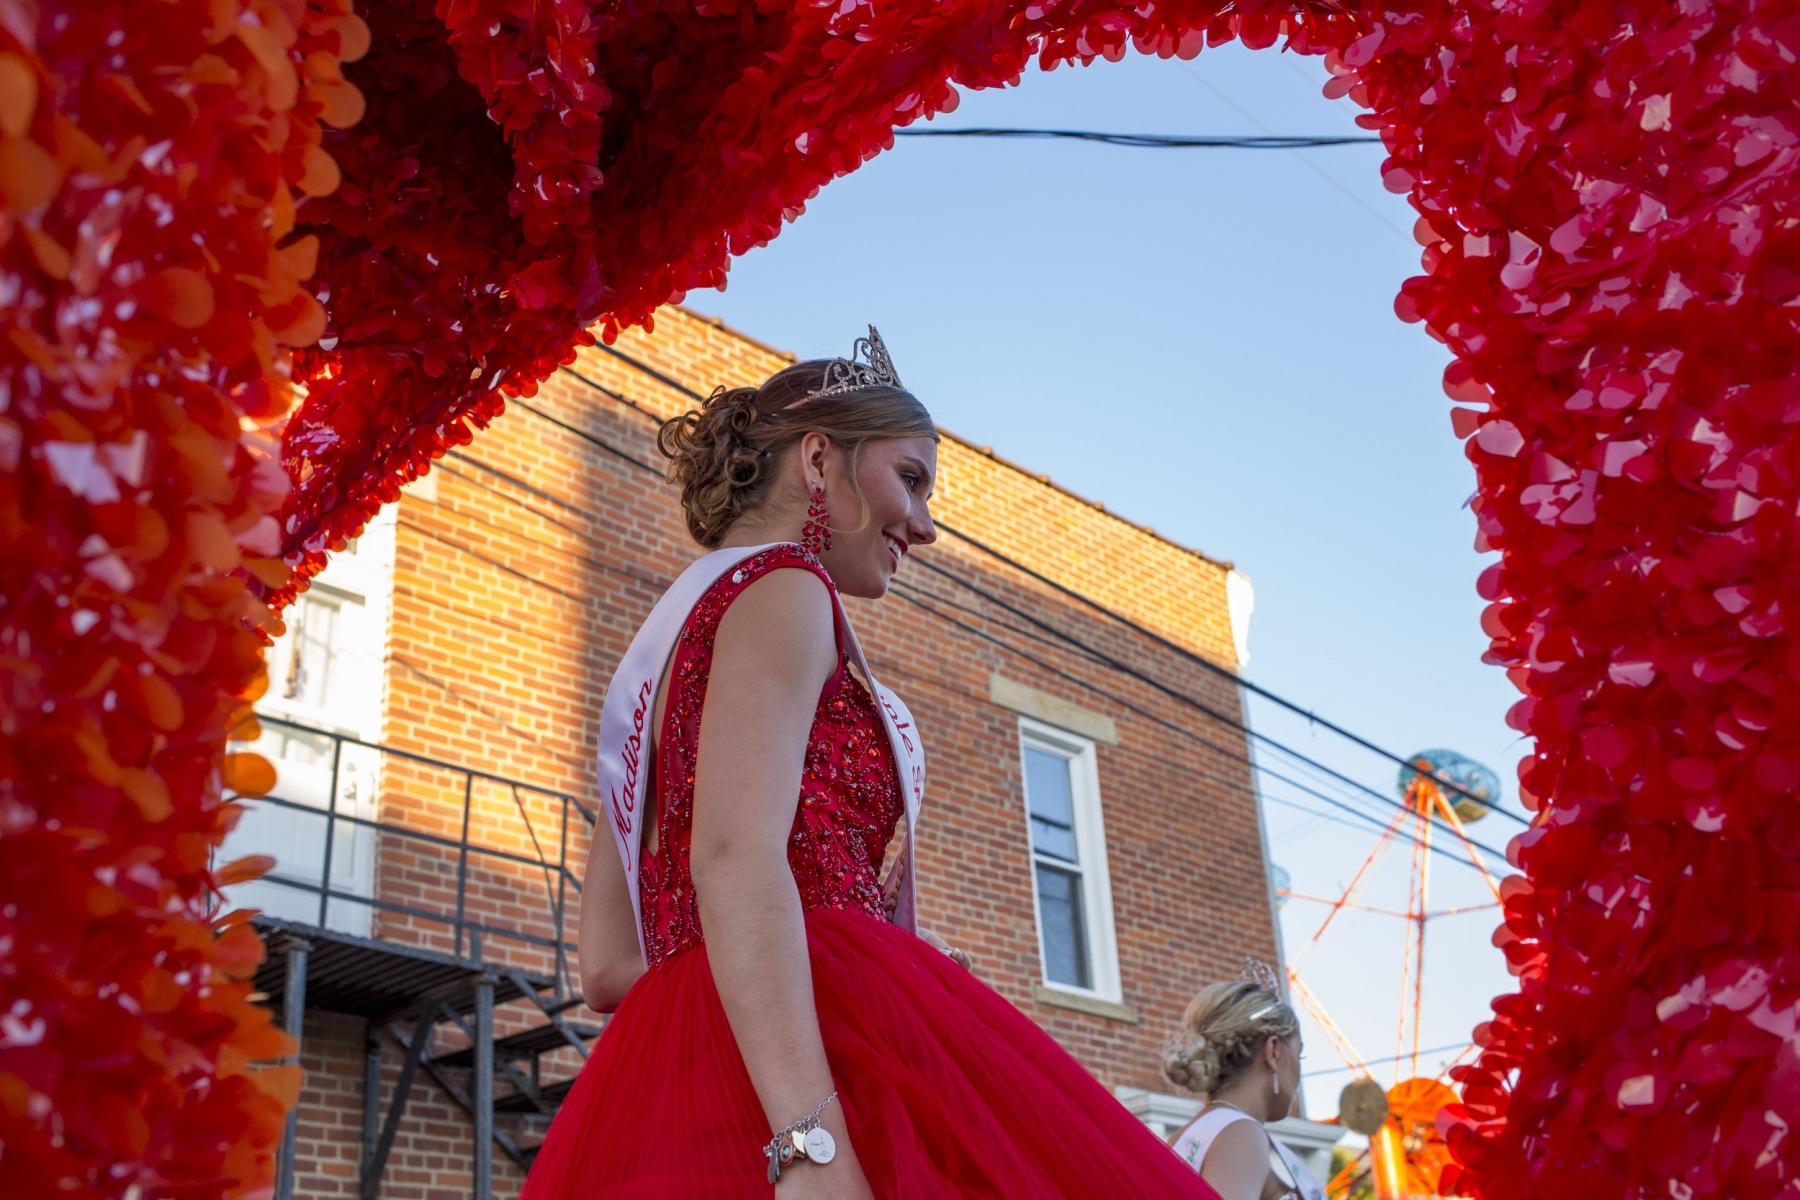 Jackson Apple Festival Queen Madison Strawser, 16, of Jackson, Ohio, sits on the Apple Queen float before the parade at the Jackson Apple Festival in Jackson, Ohio, on Wednesday, September 18, 2019.